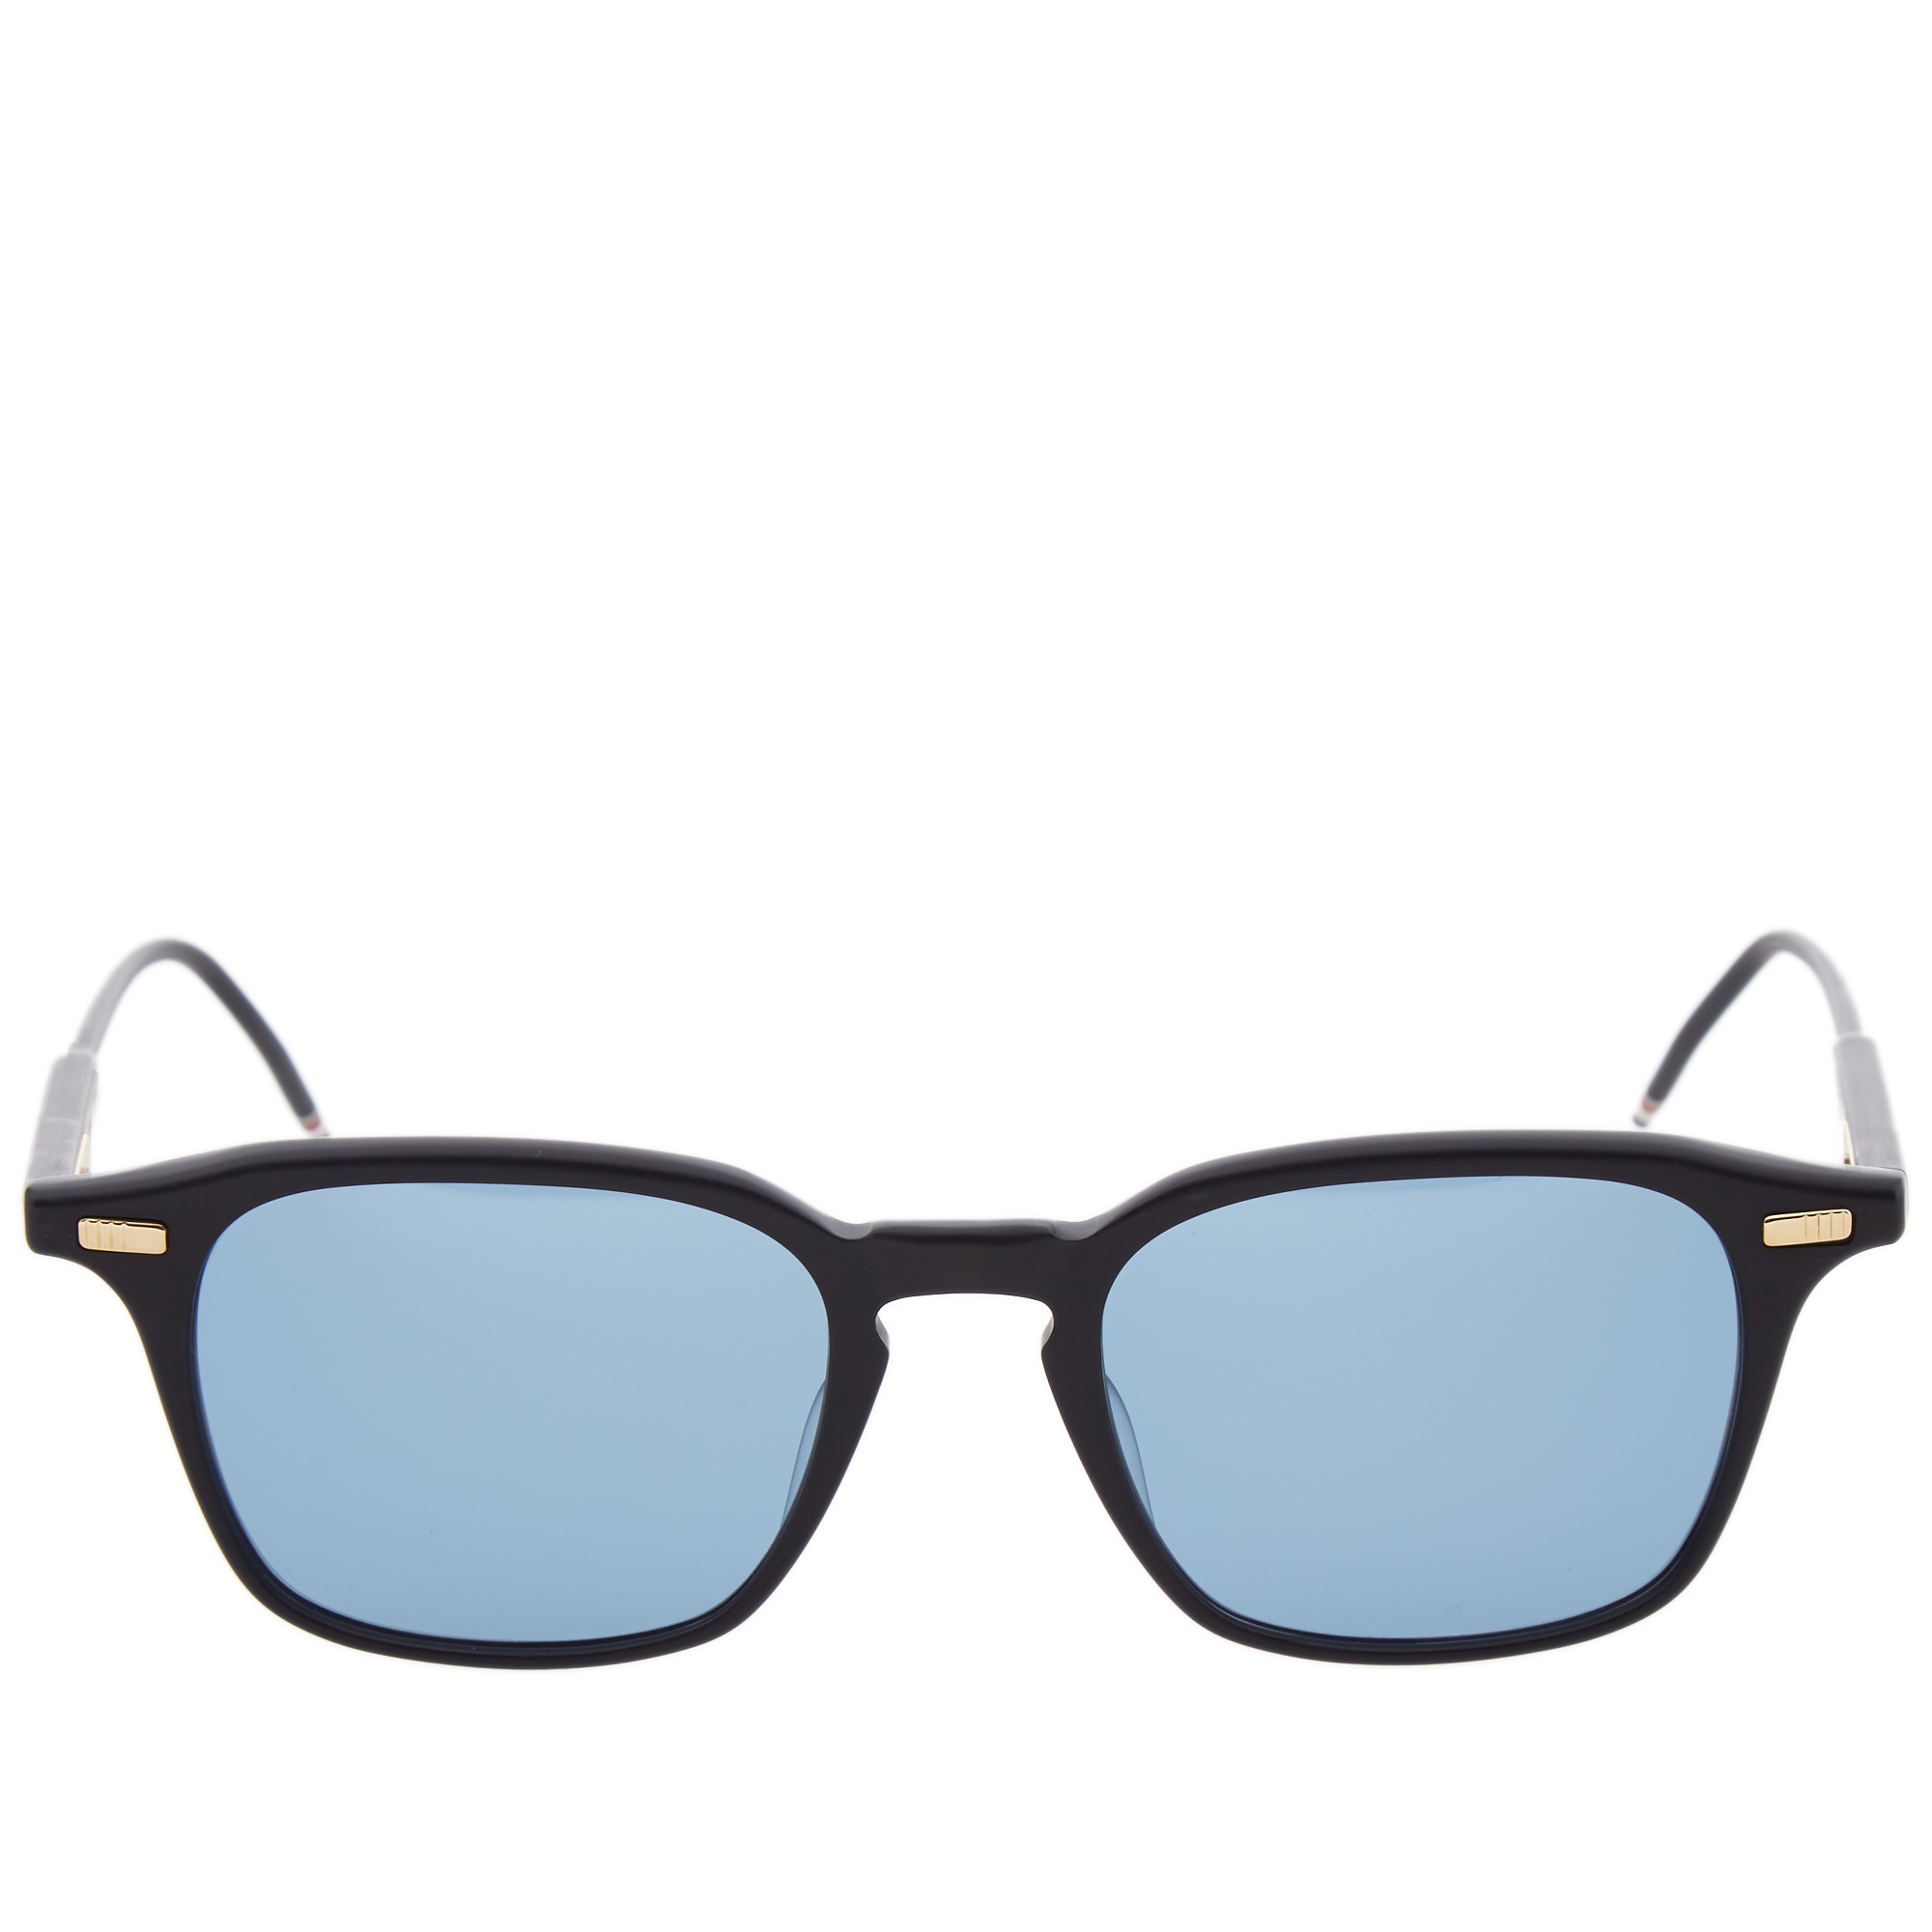 Thom Browne Sunglasses  thom browne tb 406 sunglasses matte navy dark blue